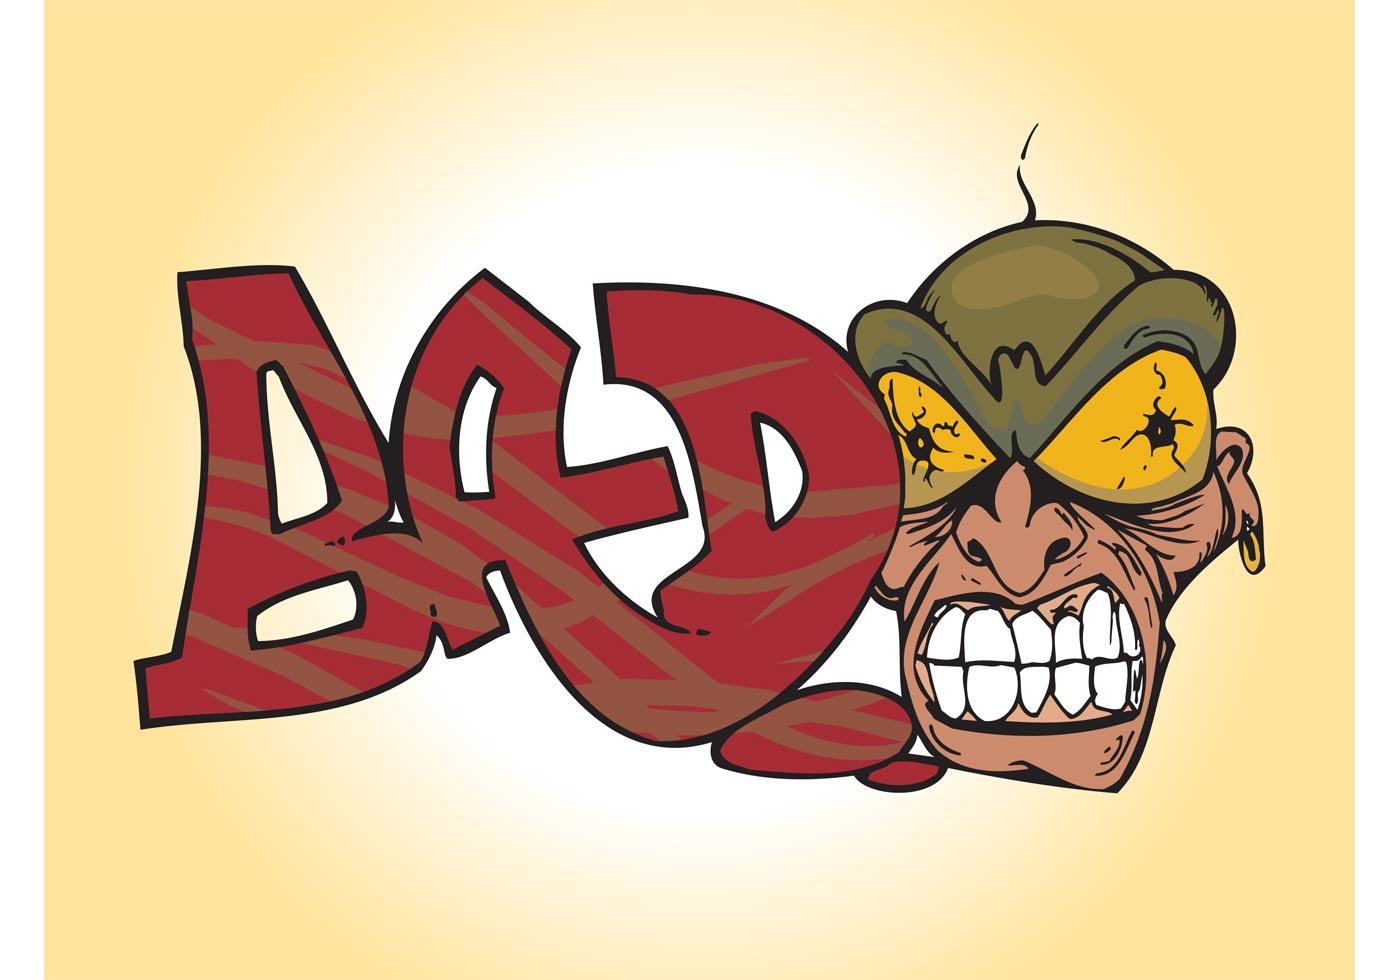 Crazy Man Graffiti Download Free Vector Art Stock